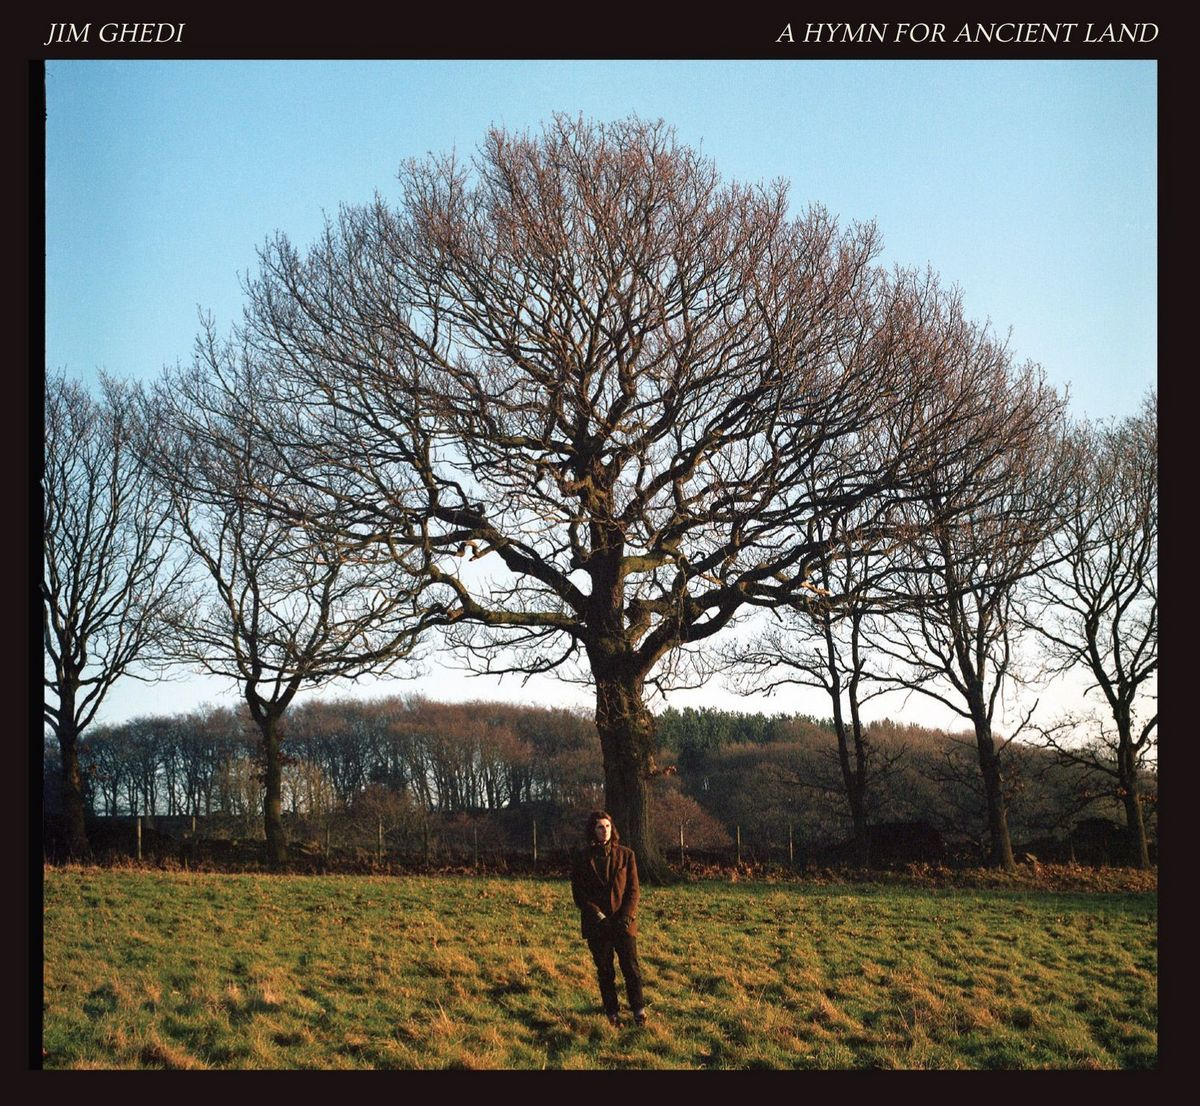 Jim Ghedi – A Hymn For Ancient Land (Basin Rock)